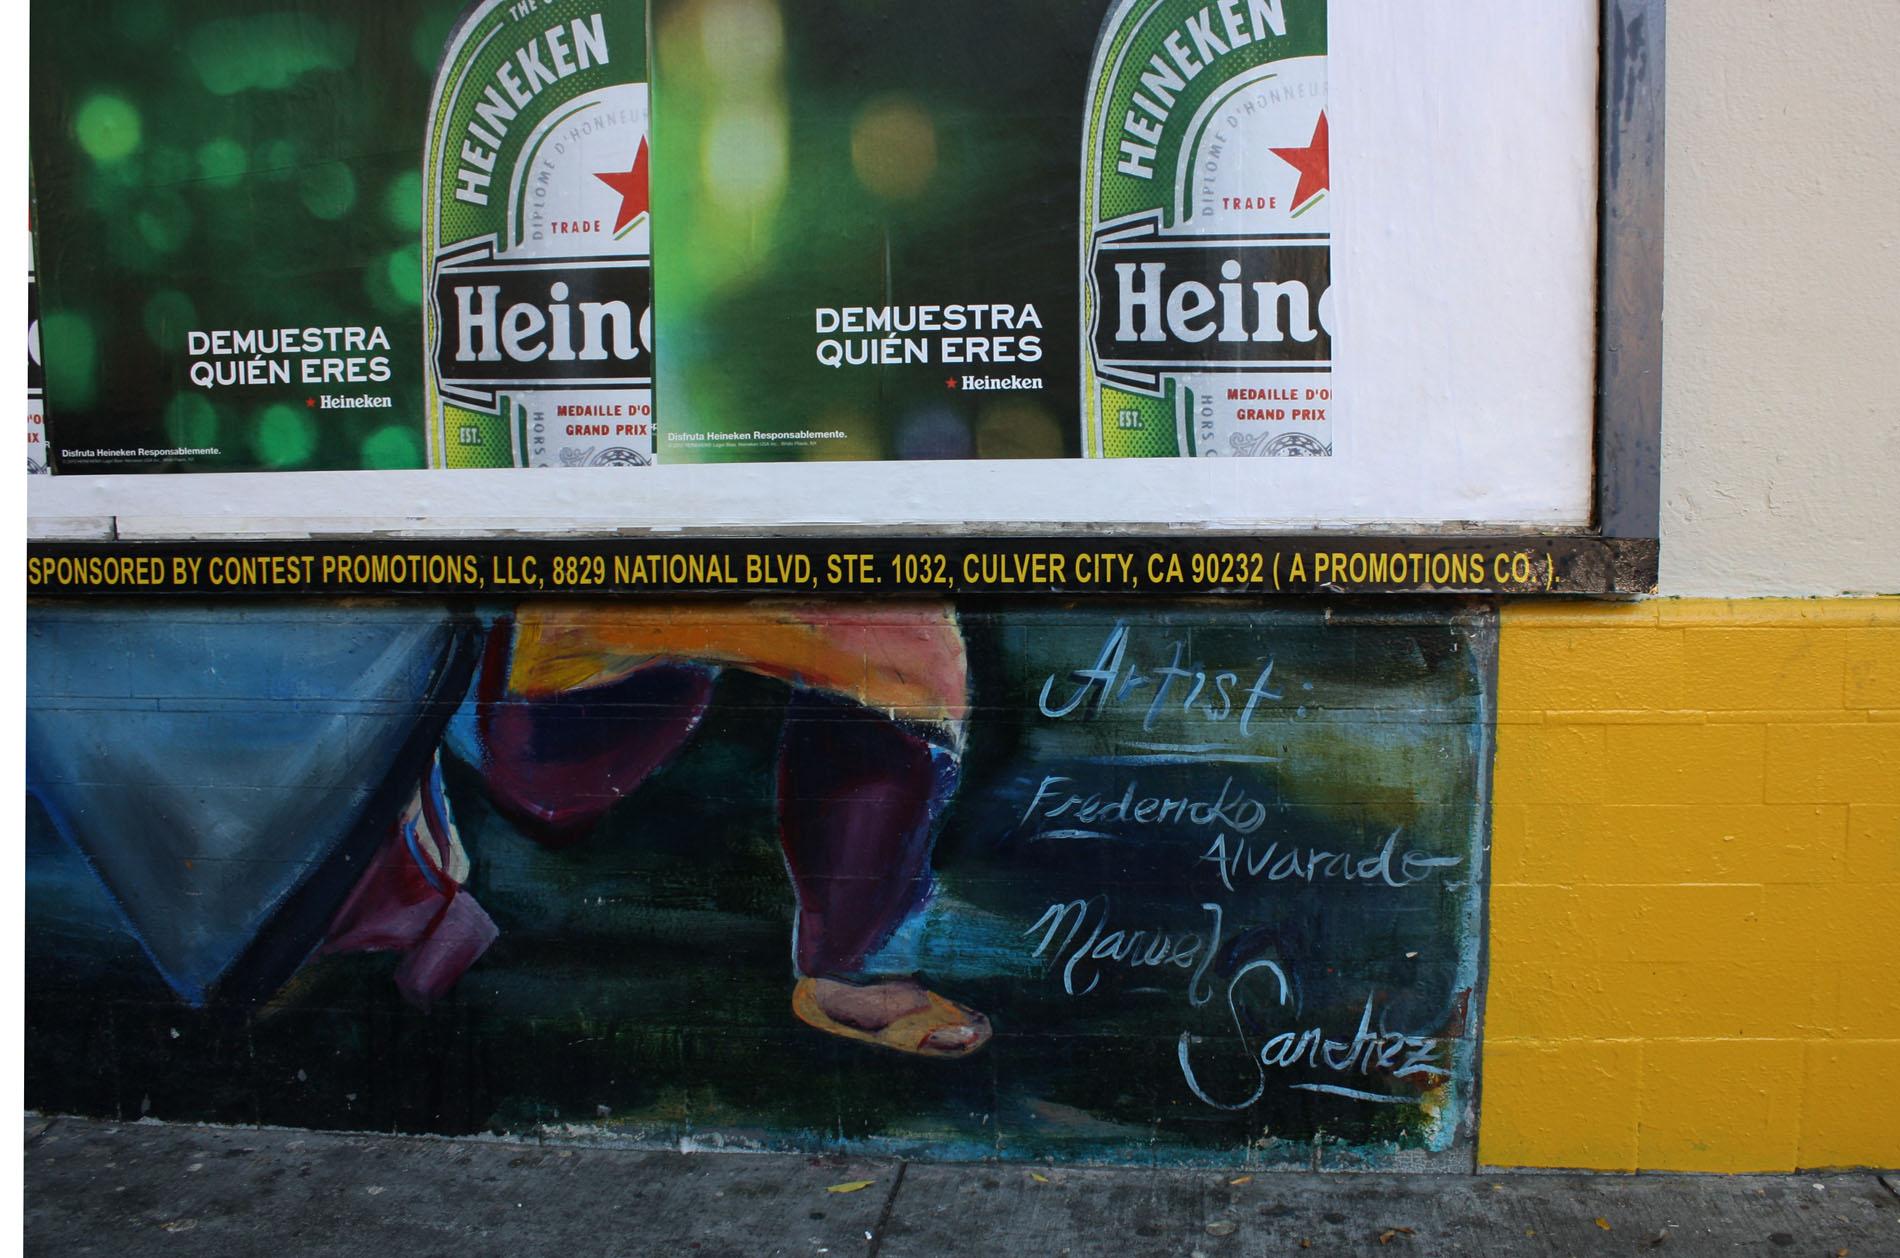 Mission Billboards Legal?